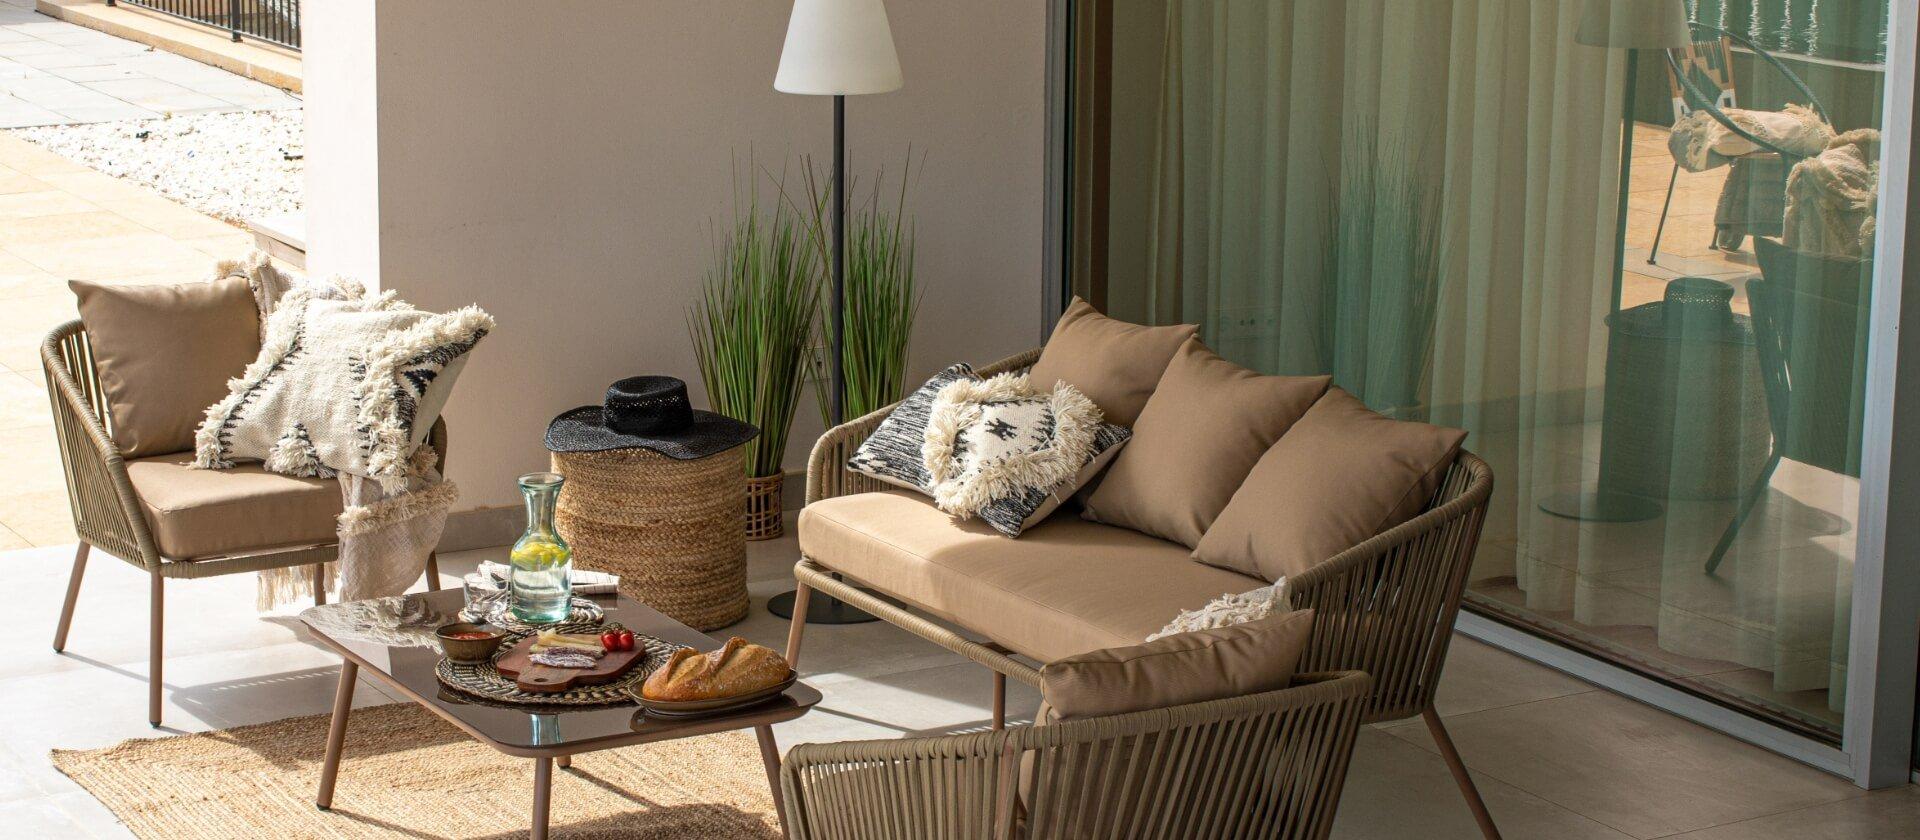 Pezzi Di Design Da Avere mobili online | mobili moderni - sklum